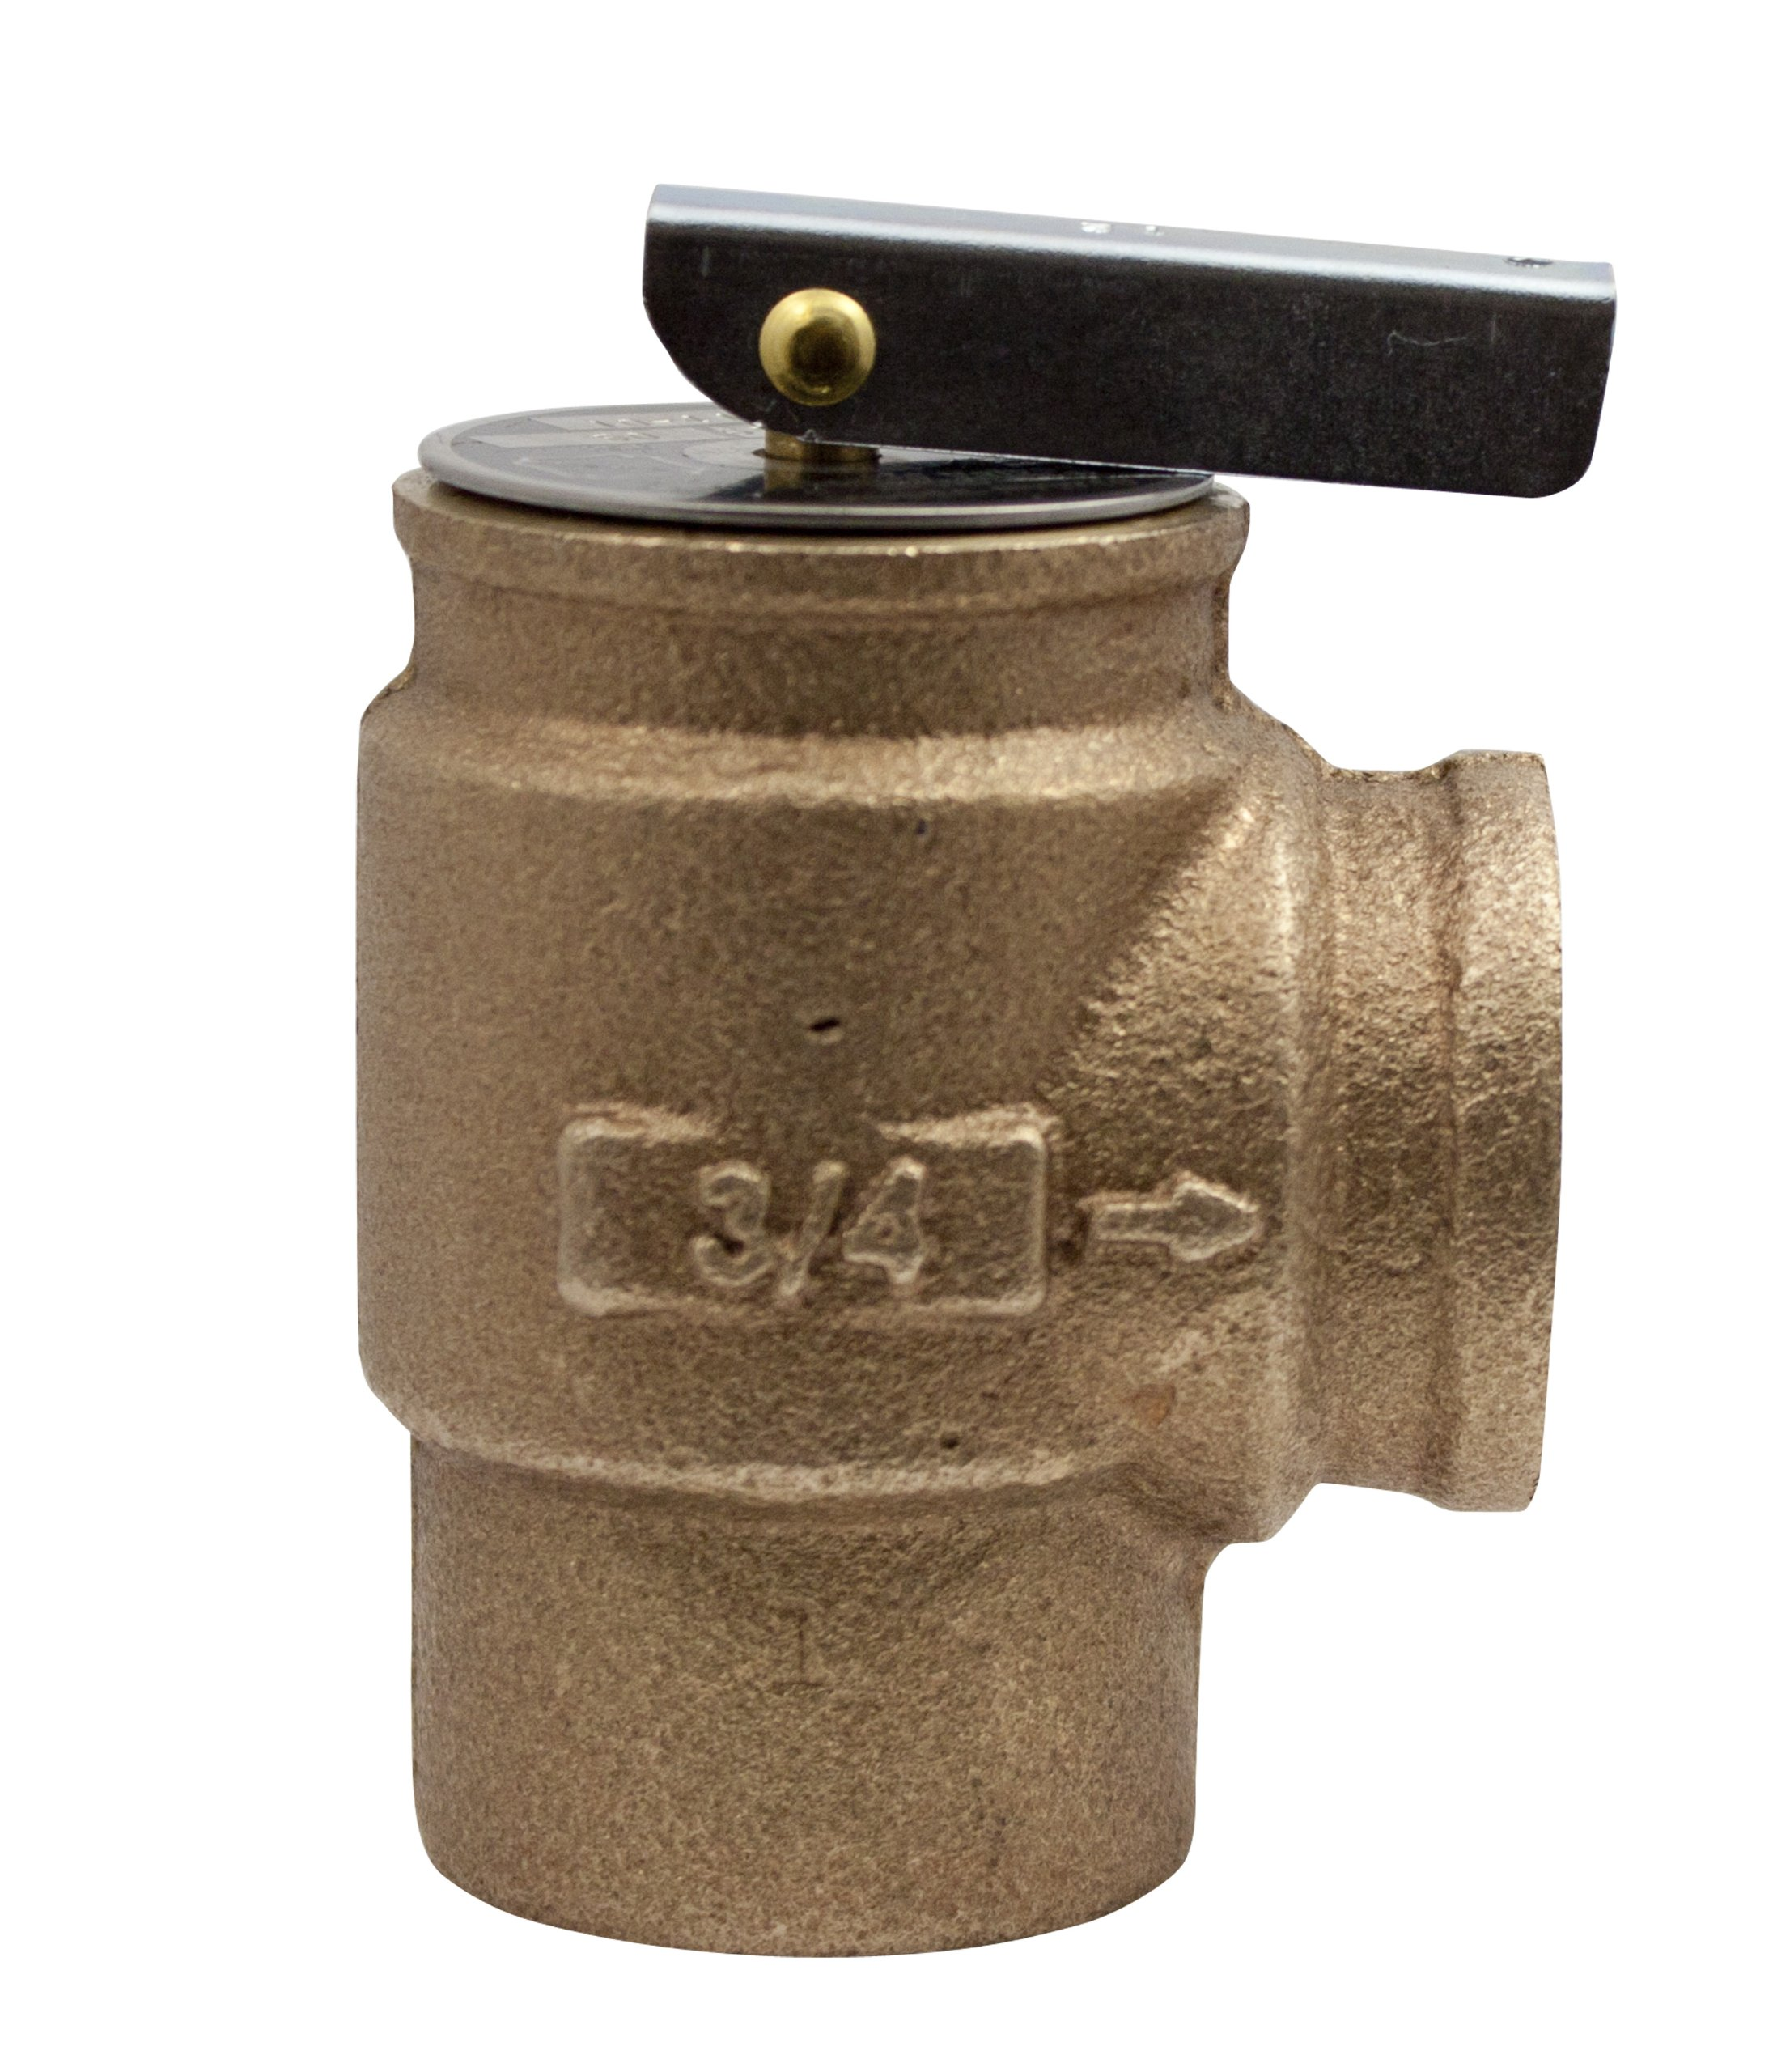 Apollo Valve 10-400 Series Bronze Safety Relief Valve, ASME Hot Water, 30 psi Set Pressure, 3/4'' NPT Female